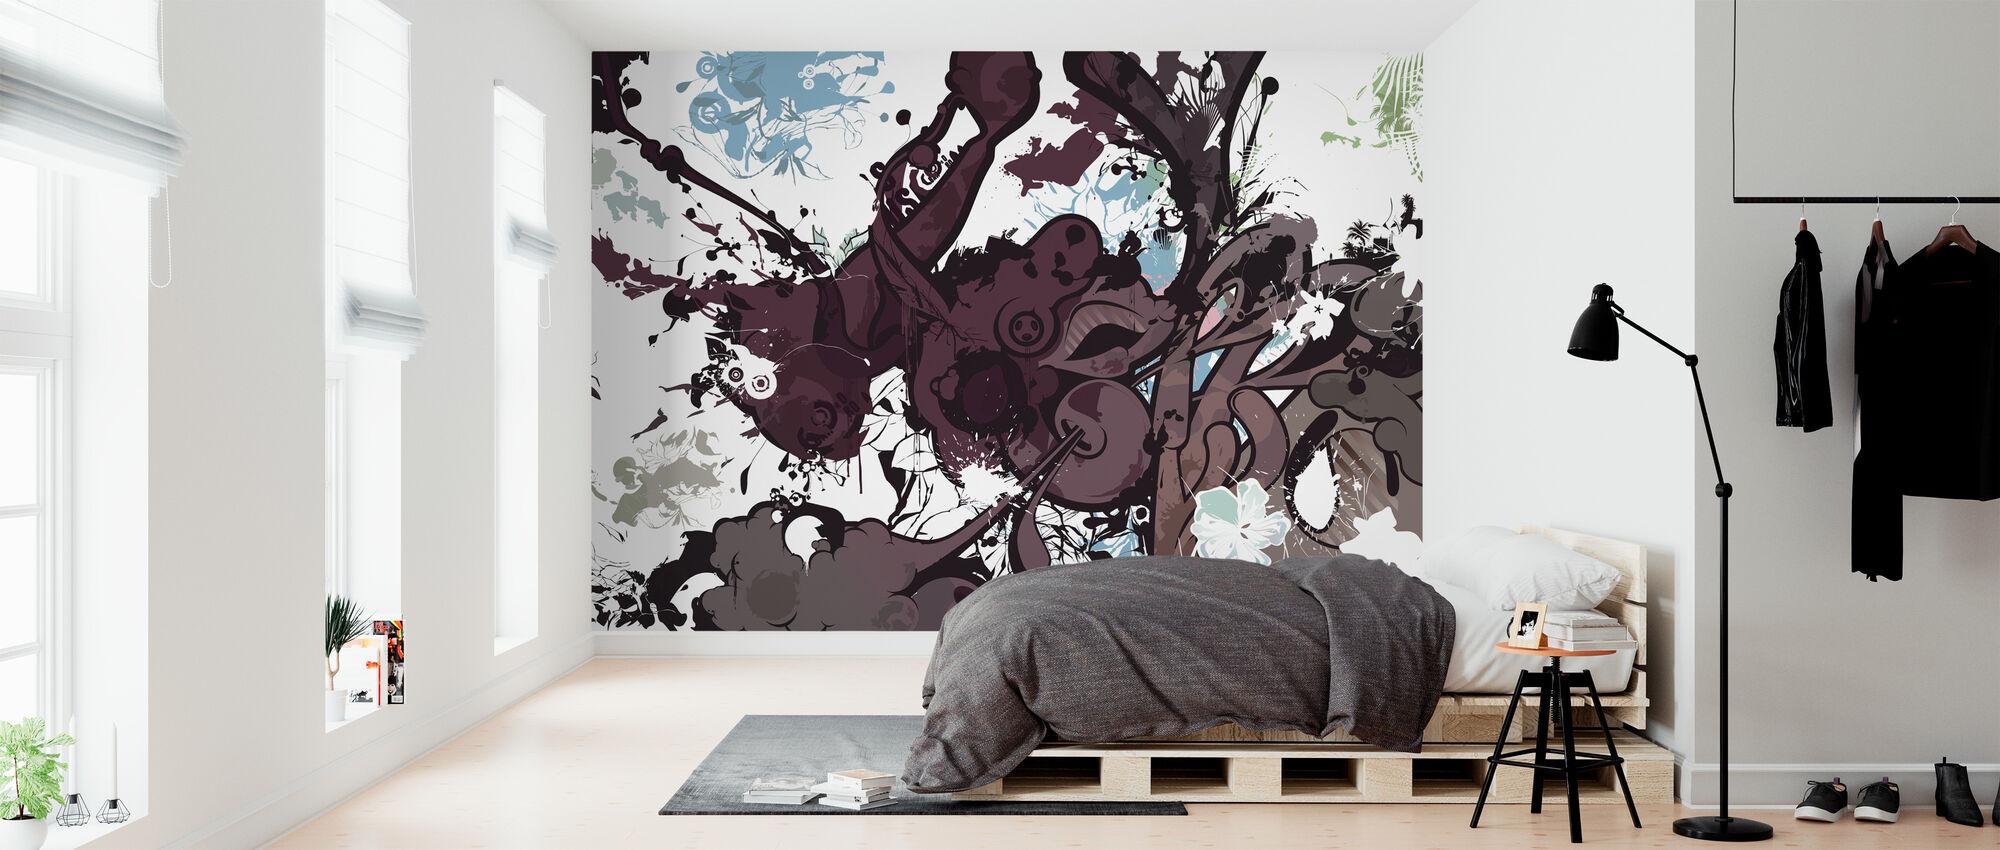 Baruserona Walls - Tapet - Soveværelse